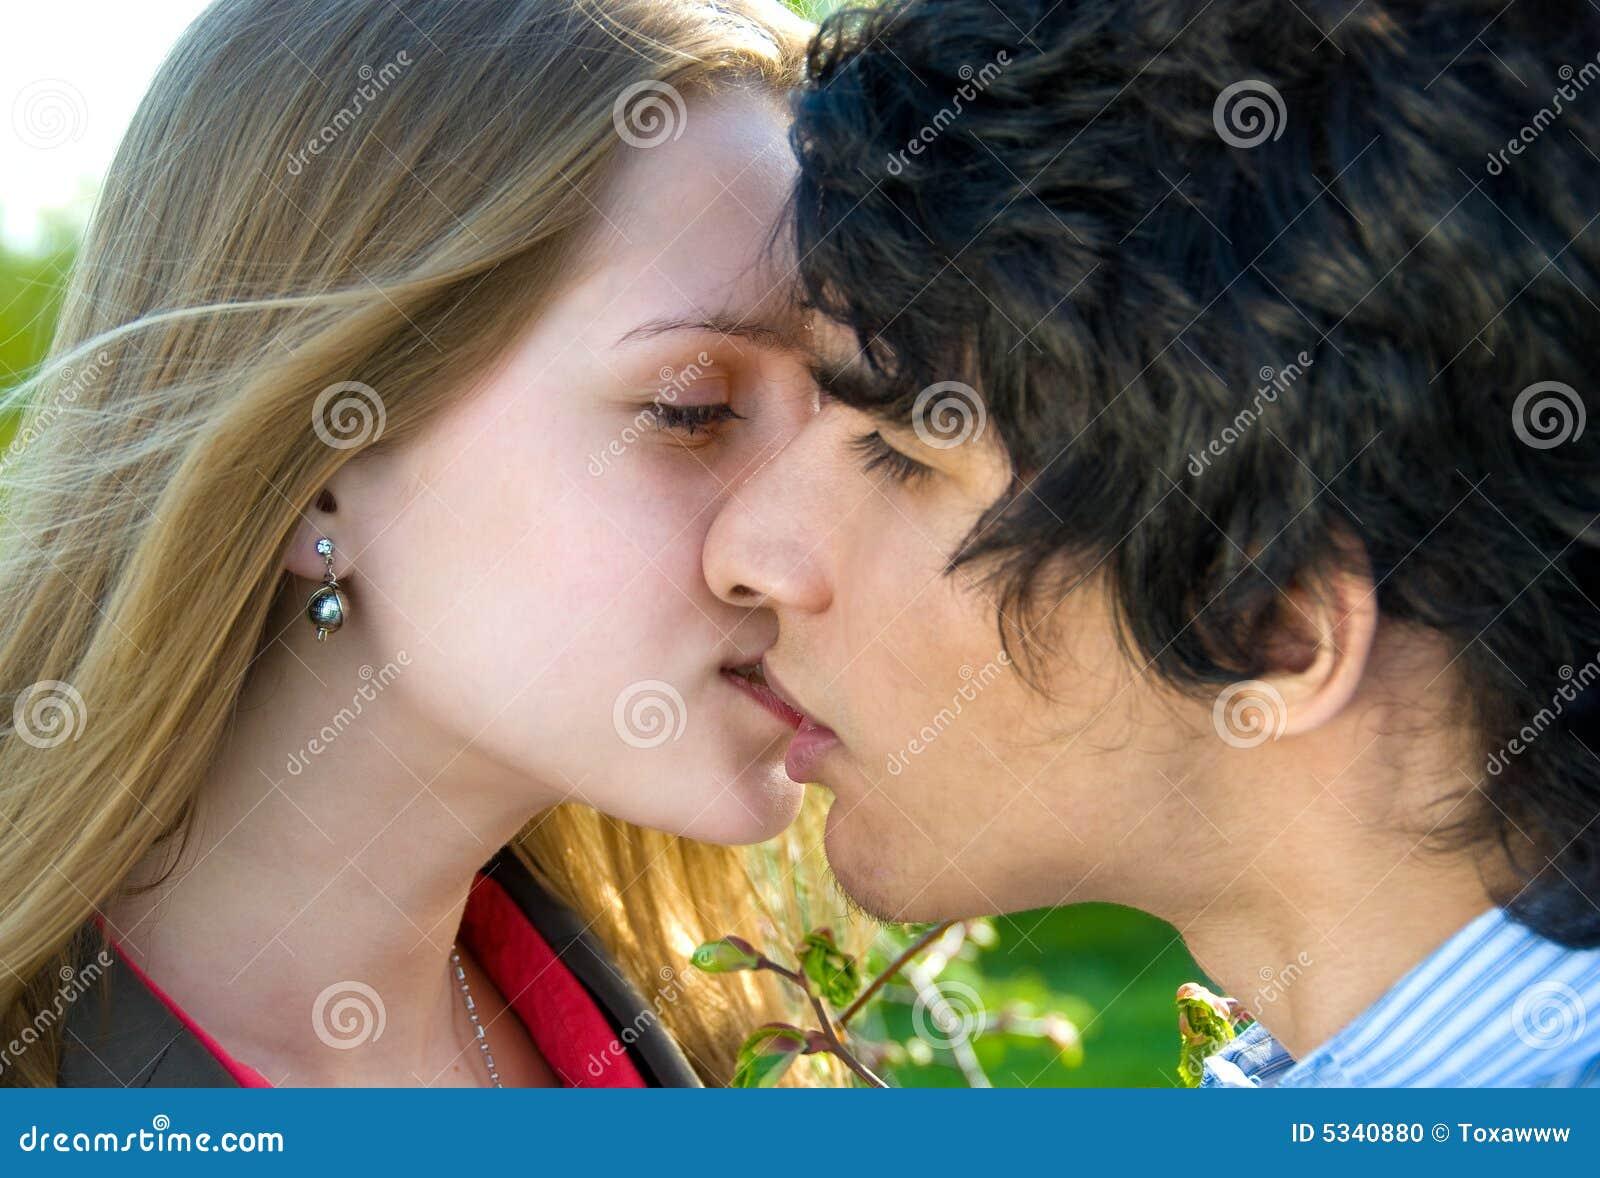 teen dating photo